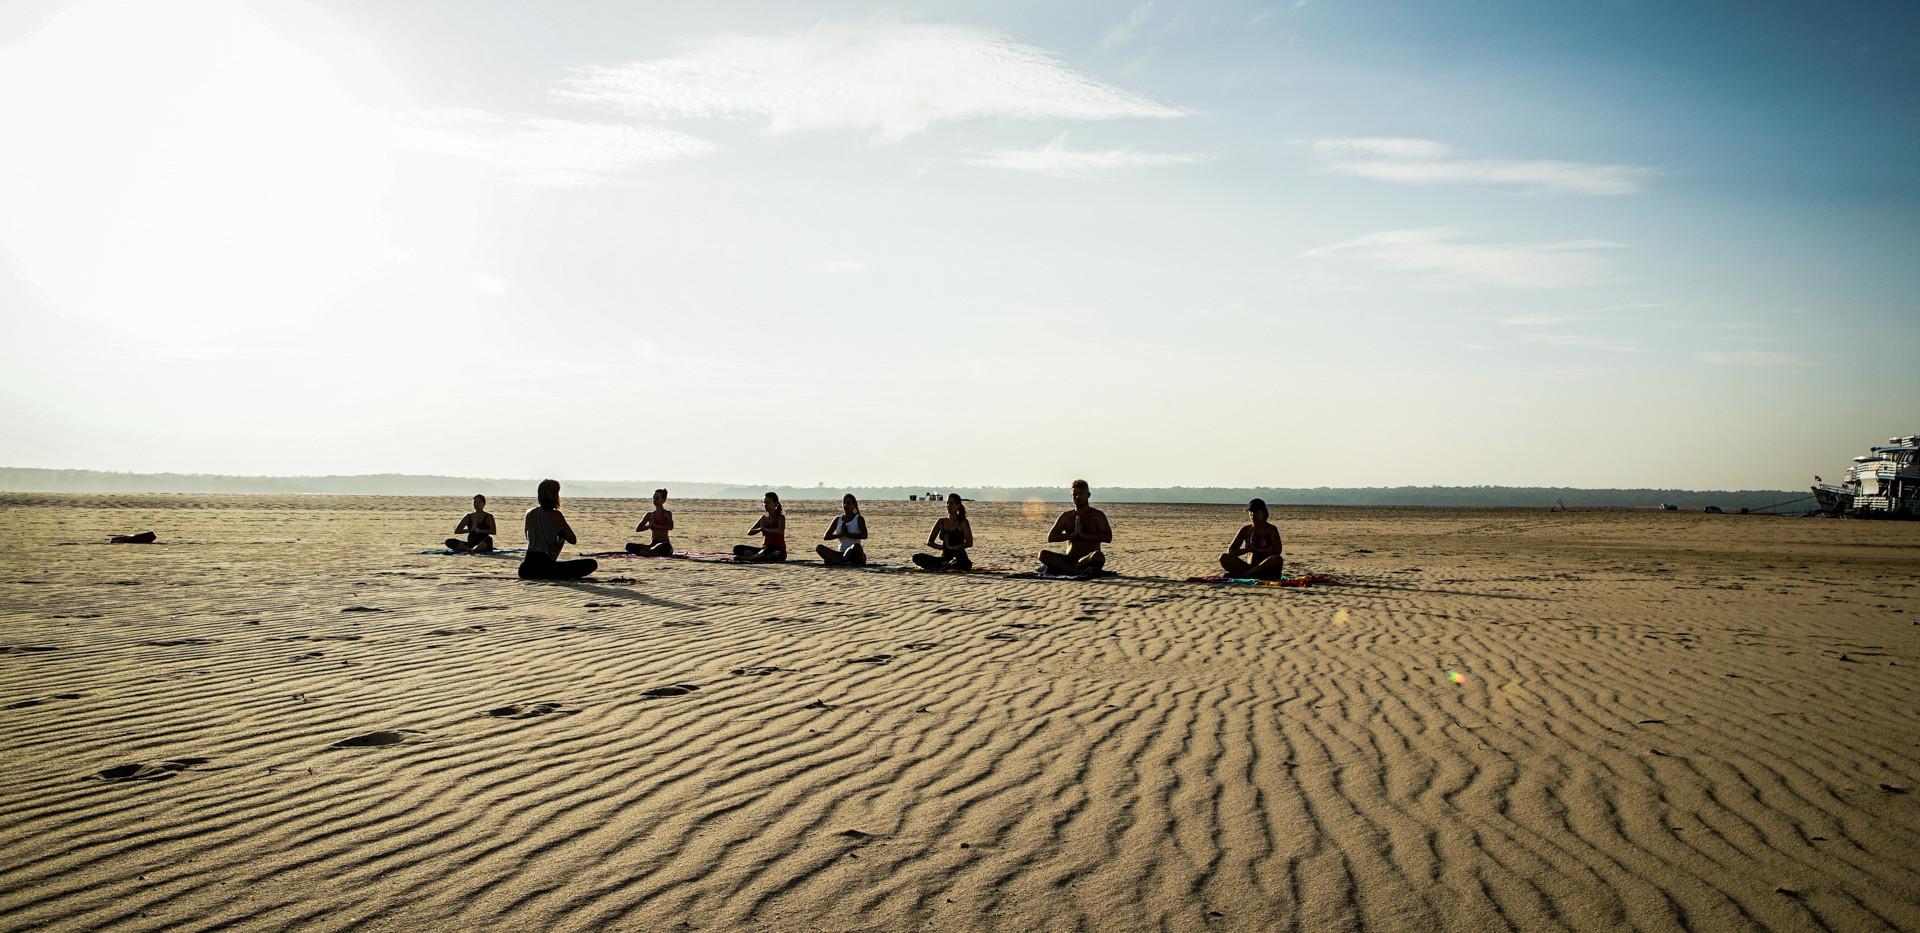 Aulas de yoga nos paraísos. Foto de Davi Boarato